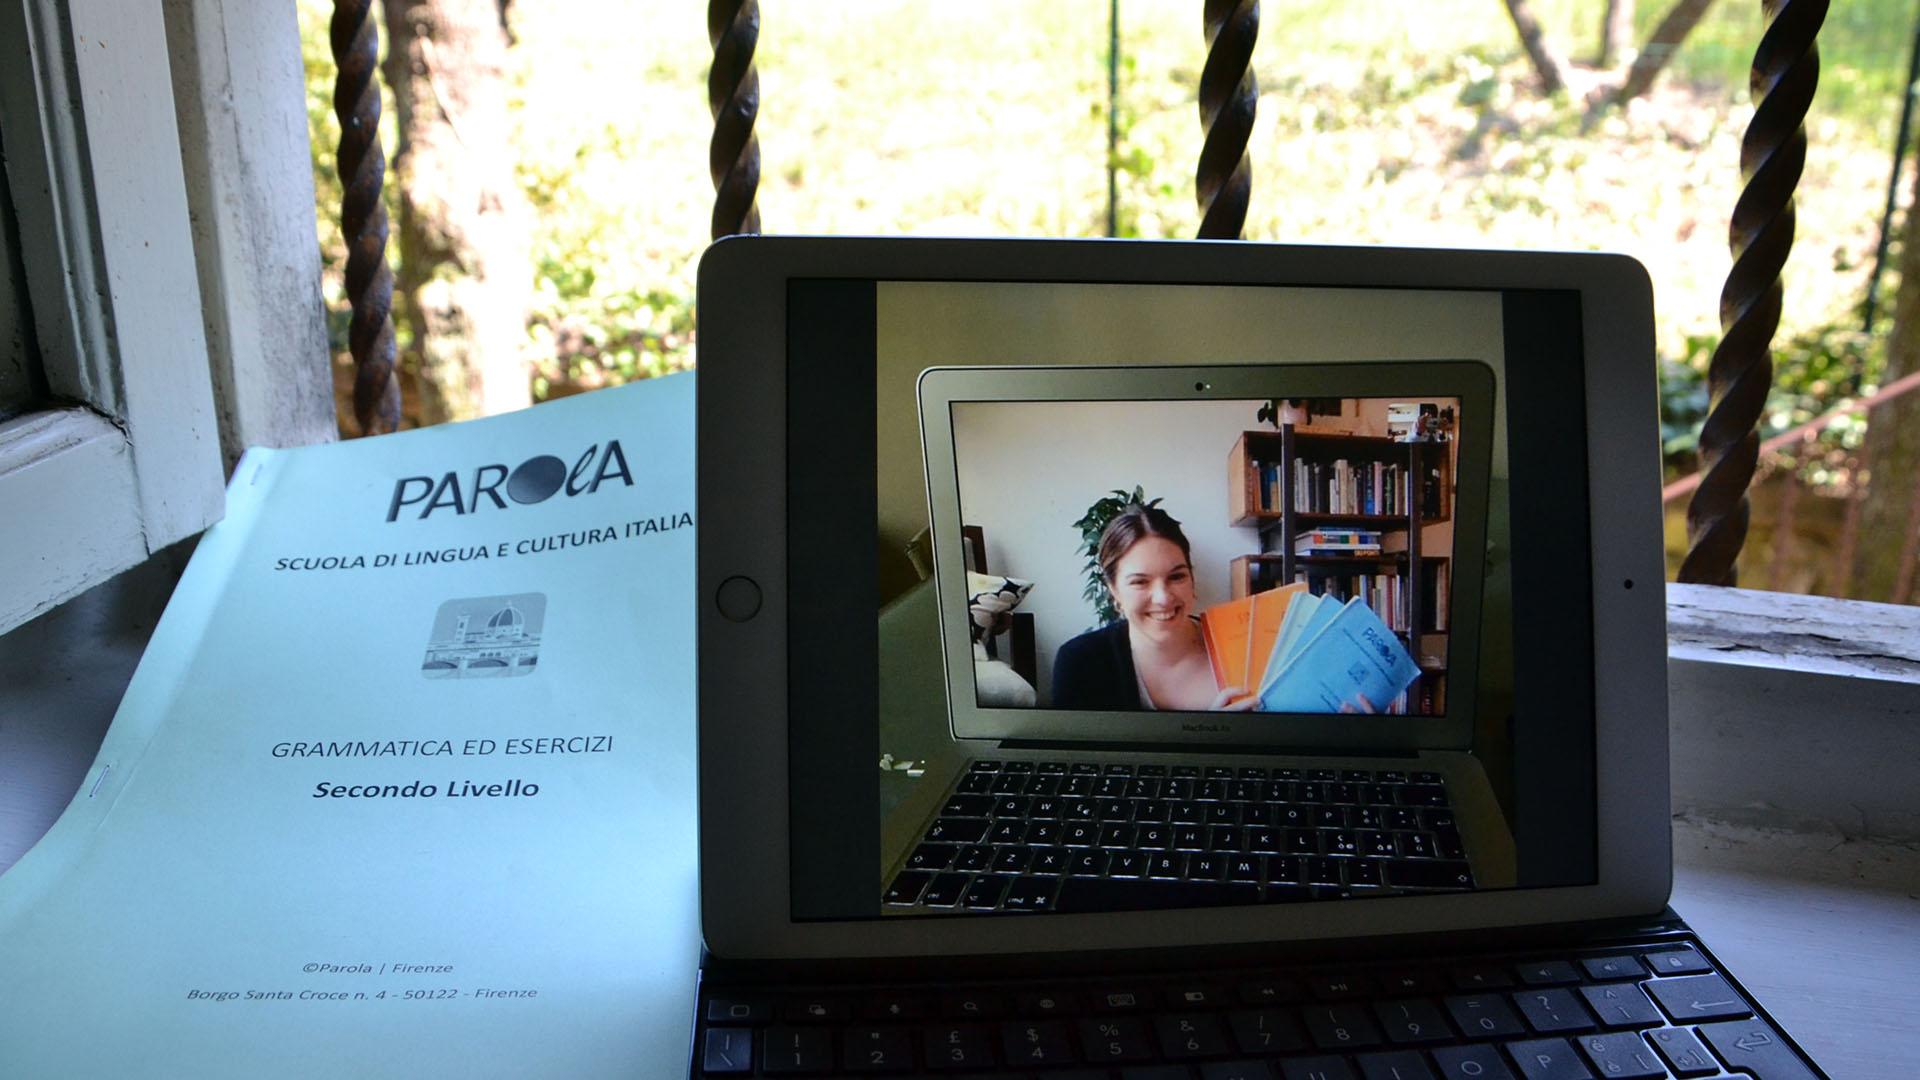 Online Italian course of Parola Italian language school